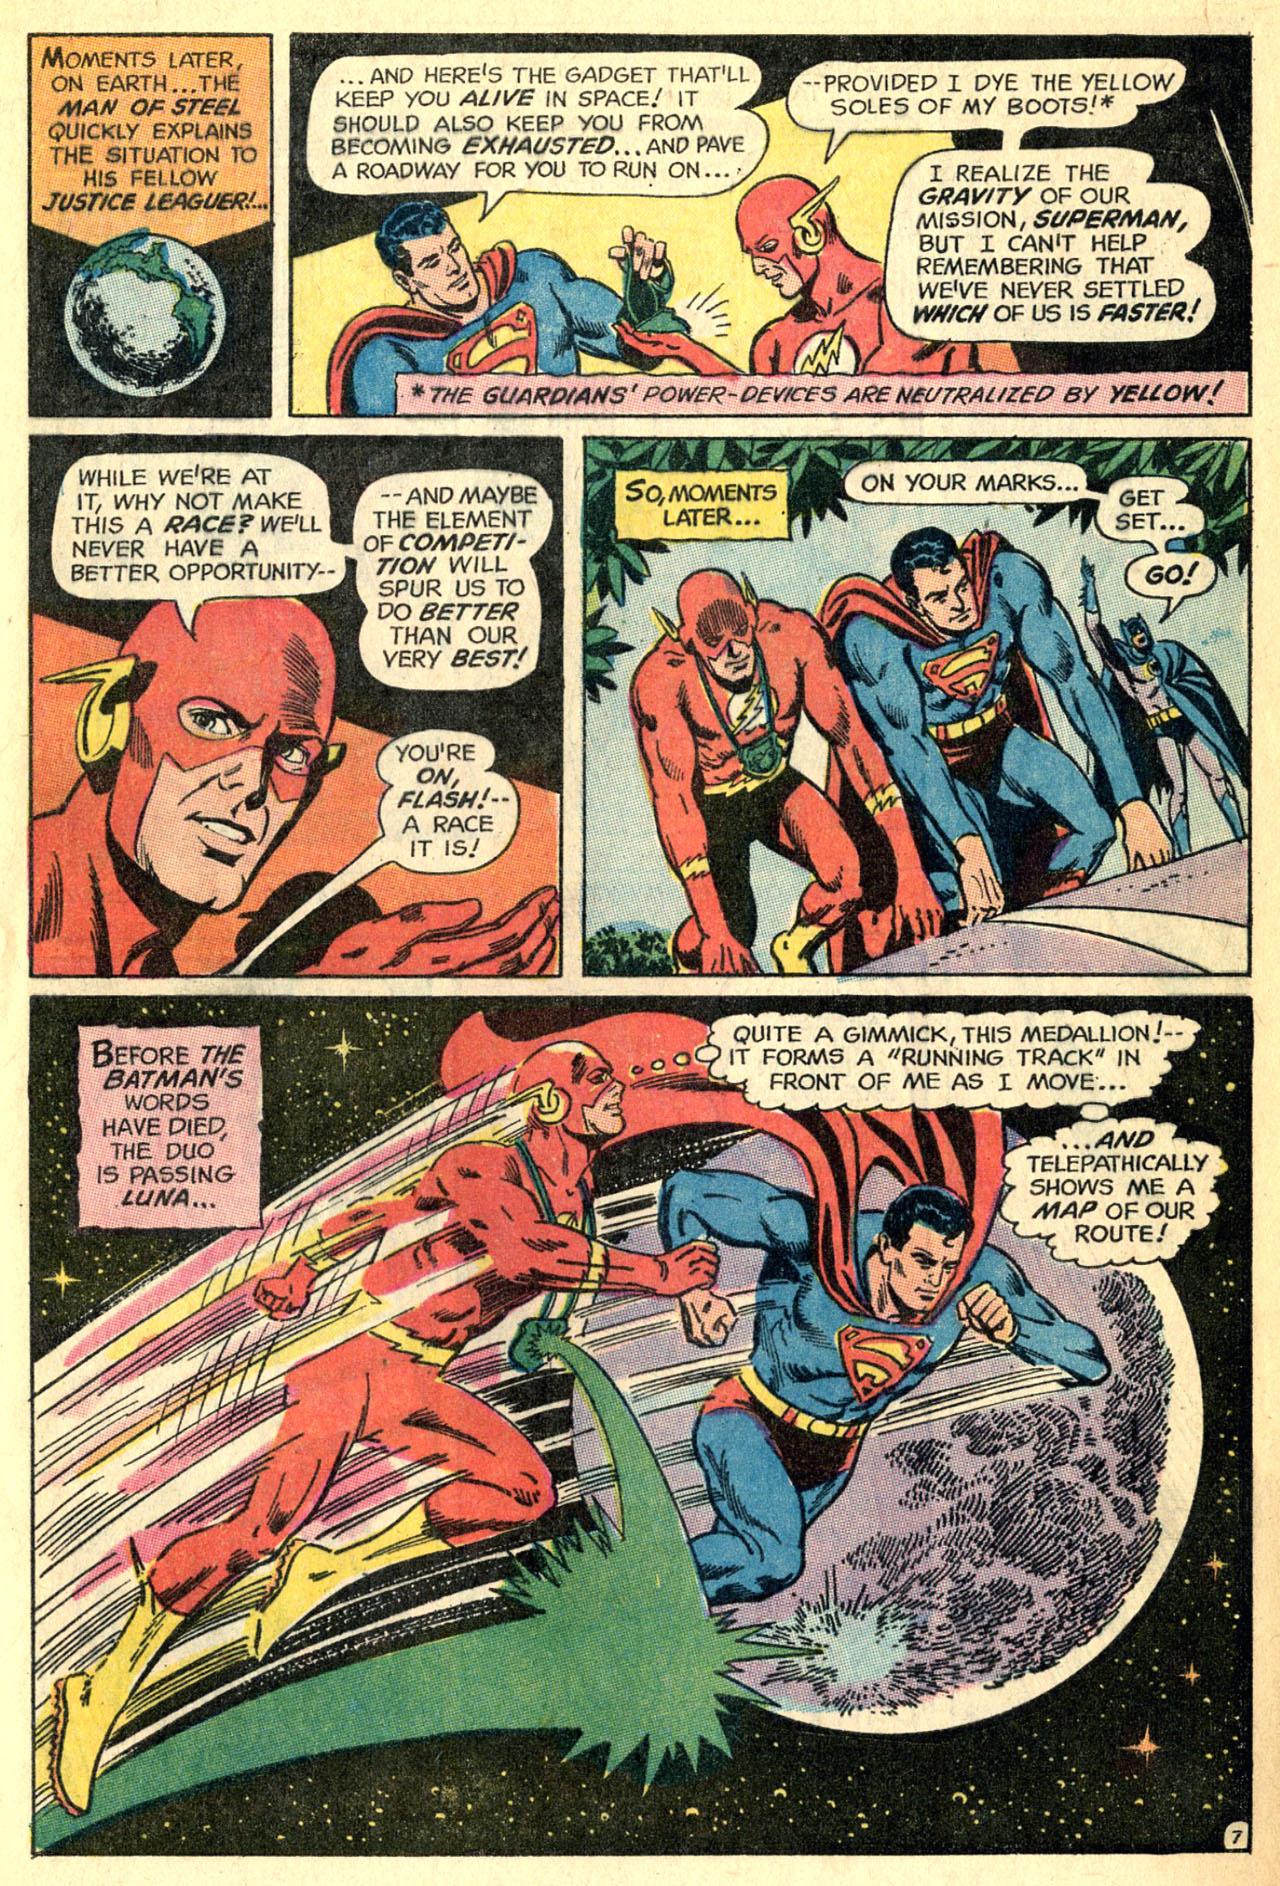 Read online World's Finest Comics comic -  Issue #198 - 10